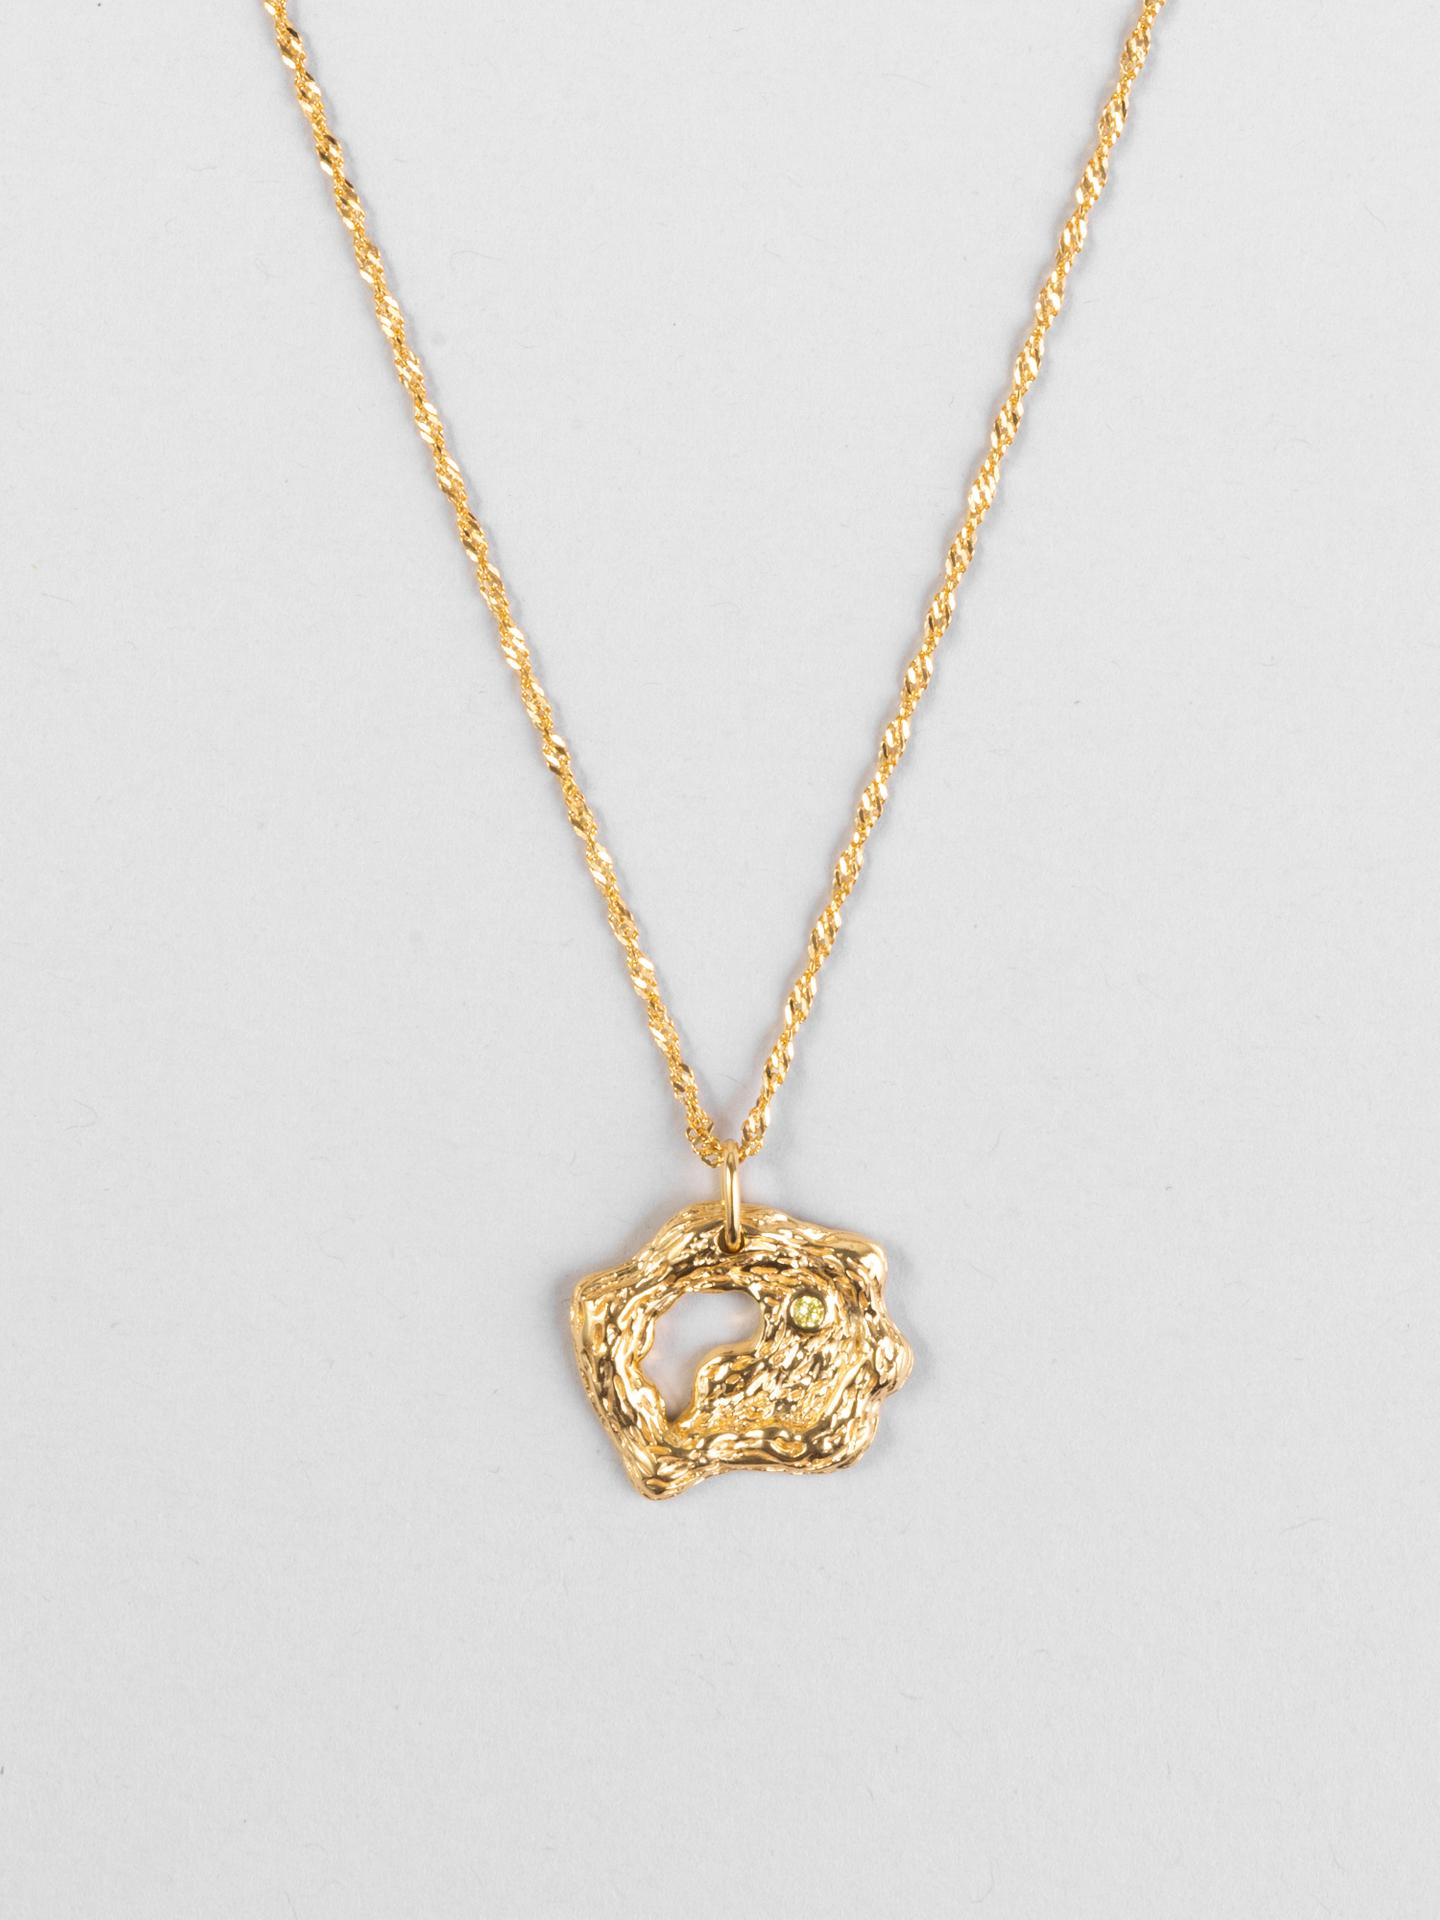 Golden eternity Necklace